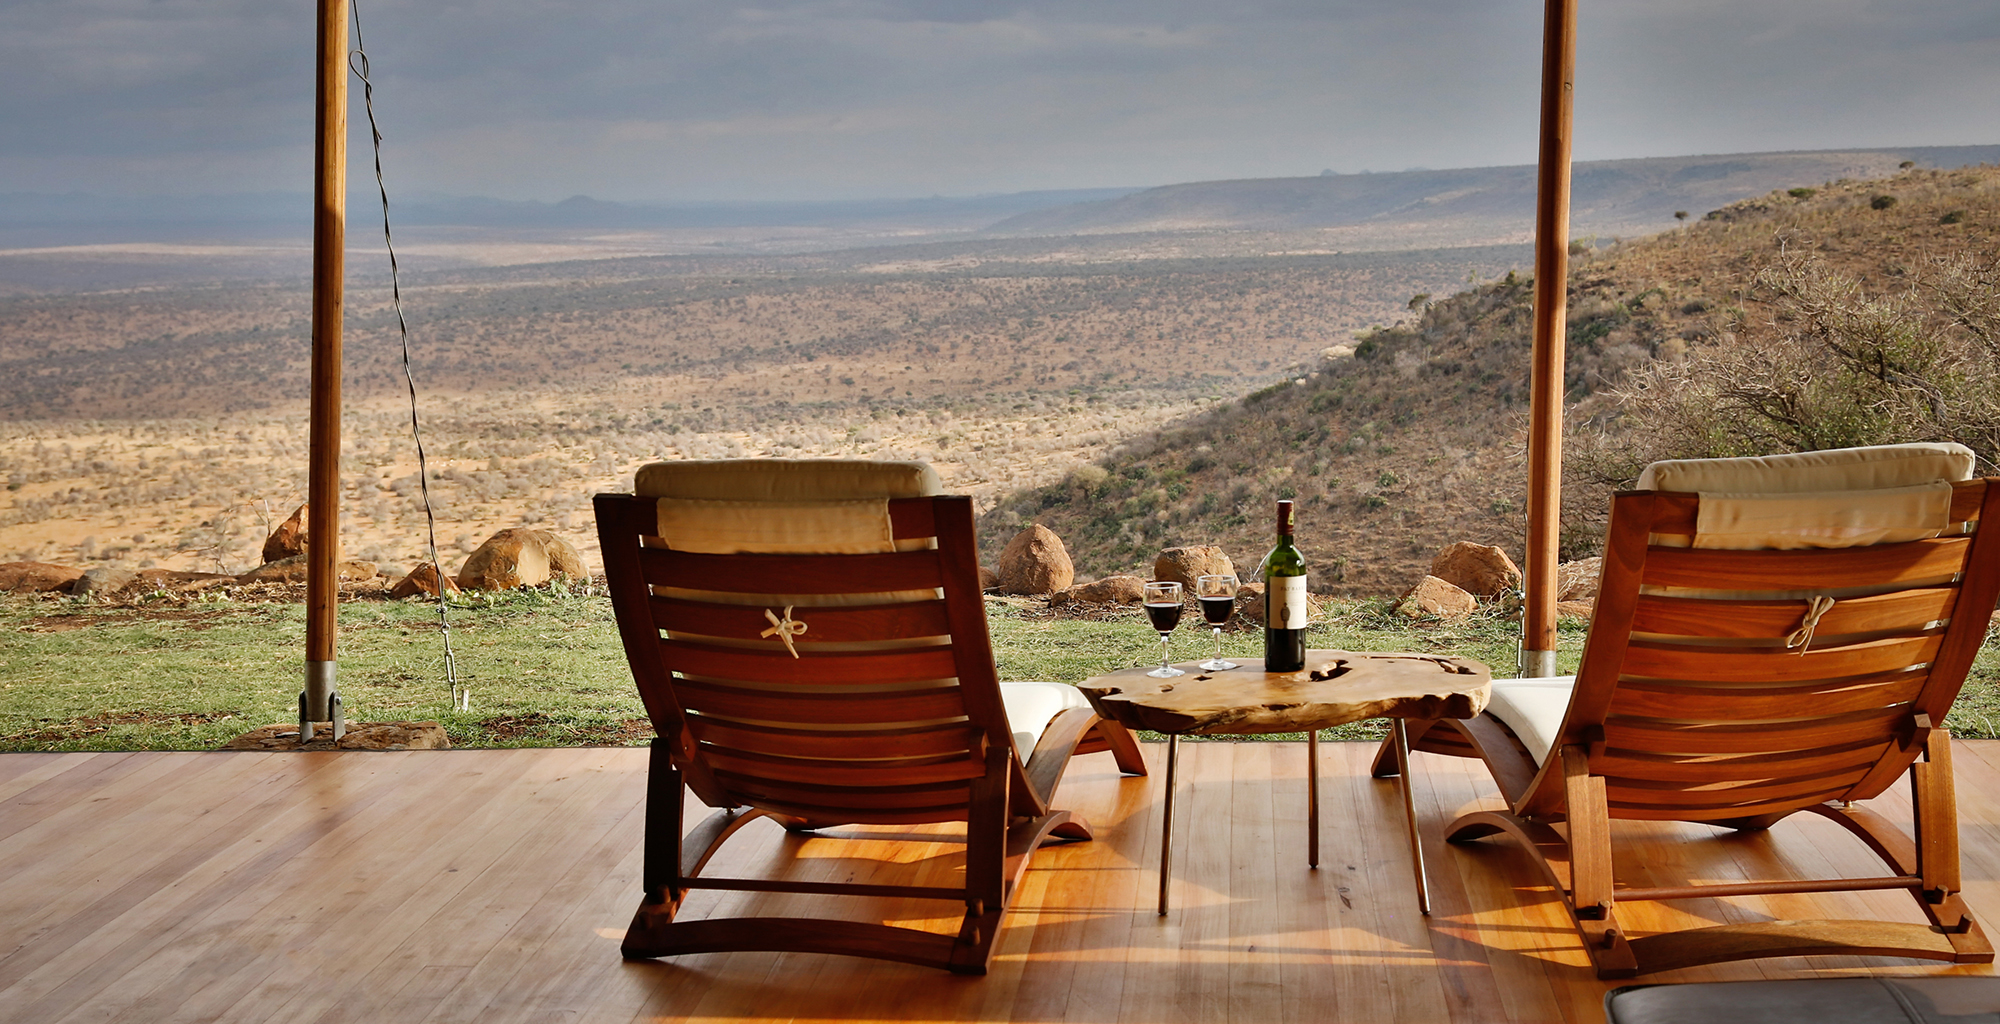 Kenya-Loisaba-Tented-Camp-Deck-View